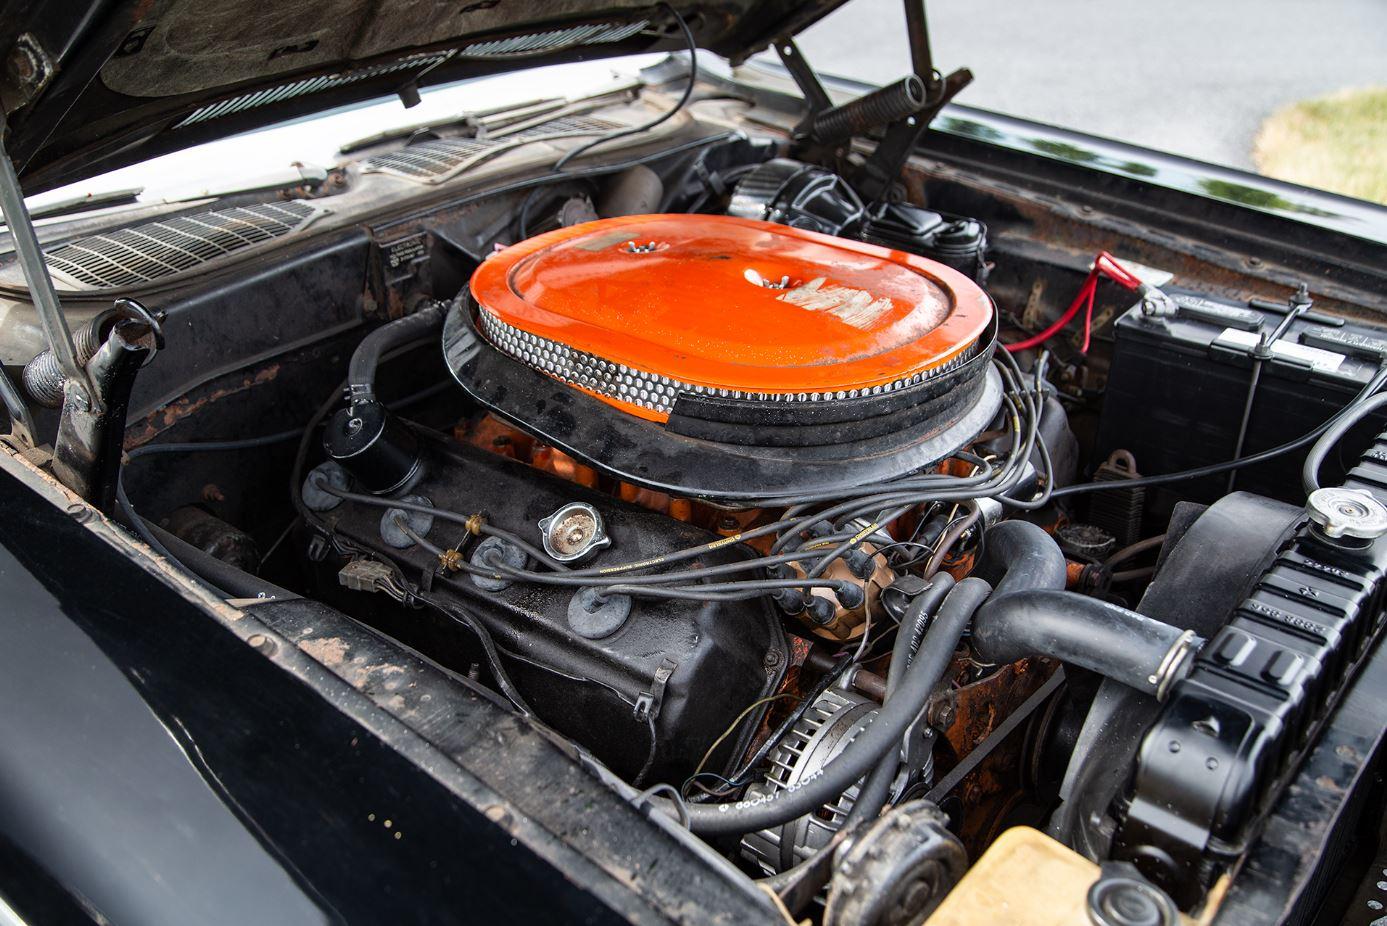 HVA - 1970 Dodge Challenger - Driving Experience - 426 HEMI Engine